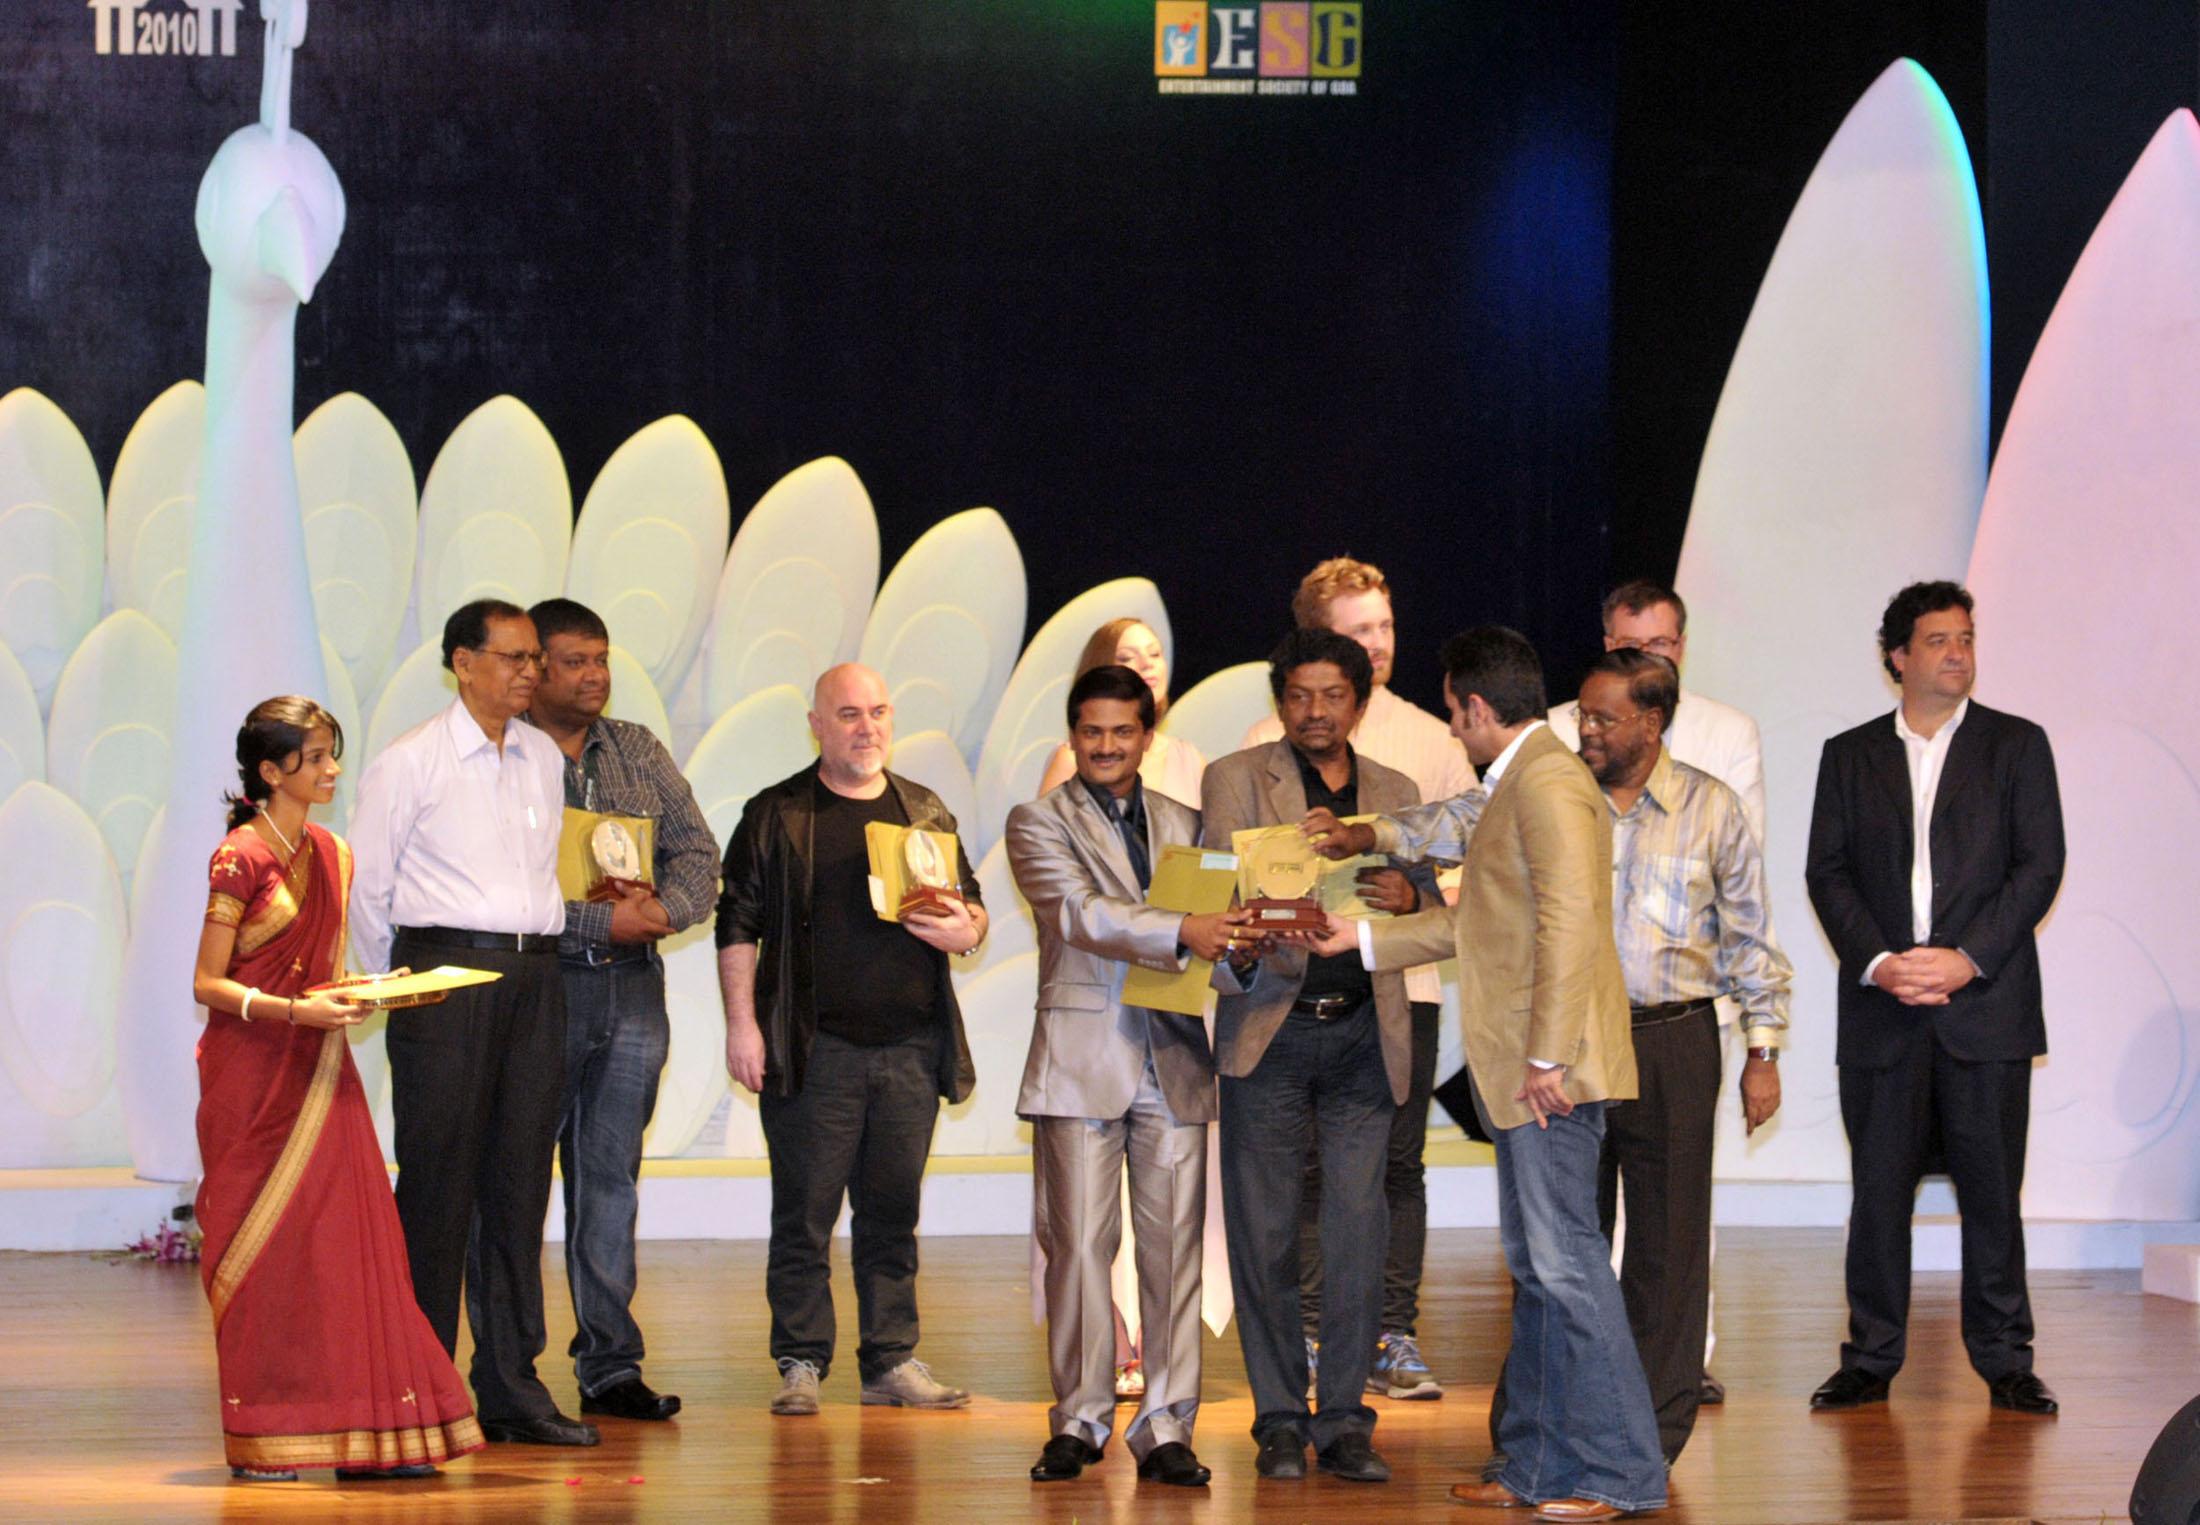 Choudhury Mohan Jatua With Party Members